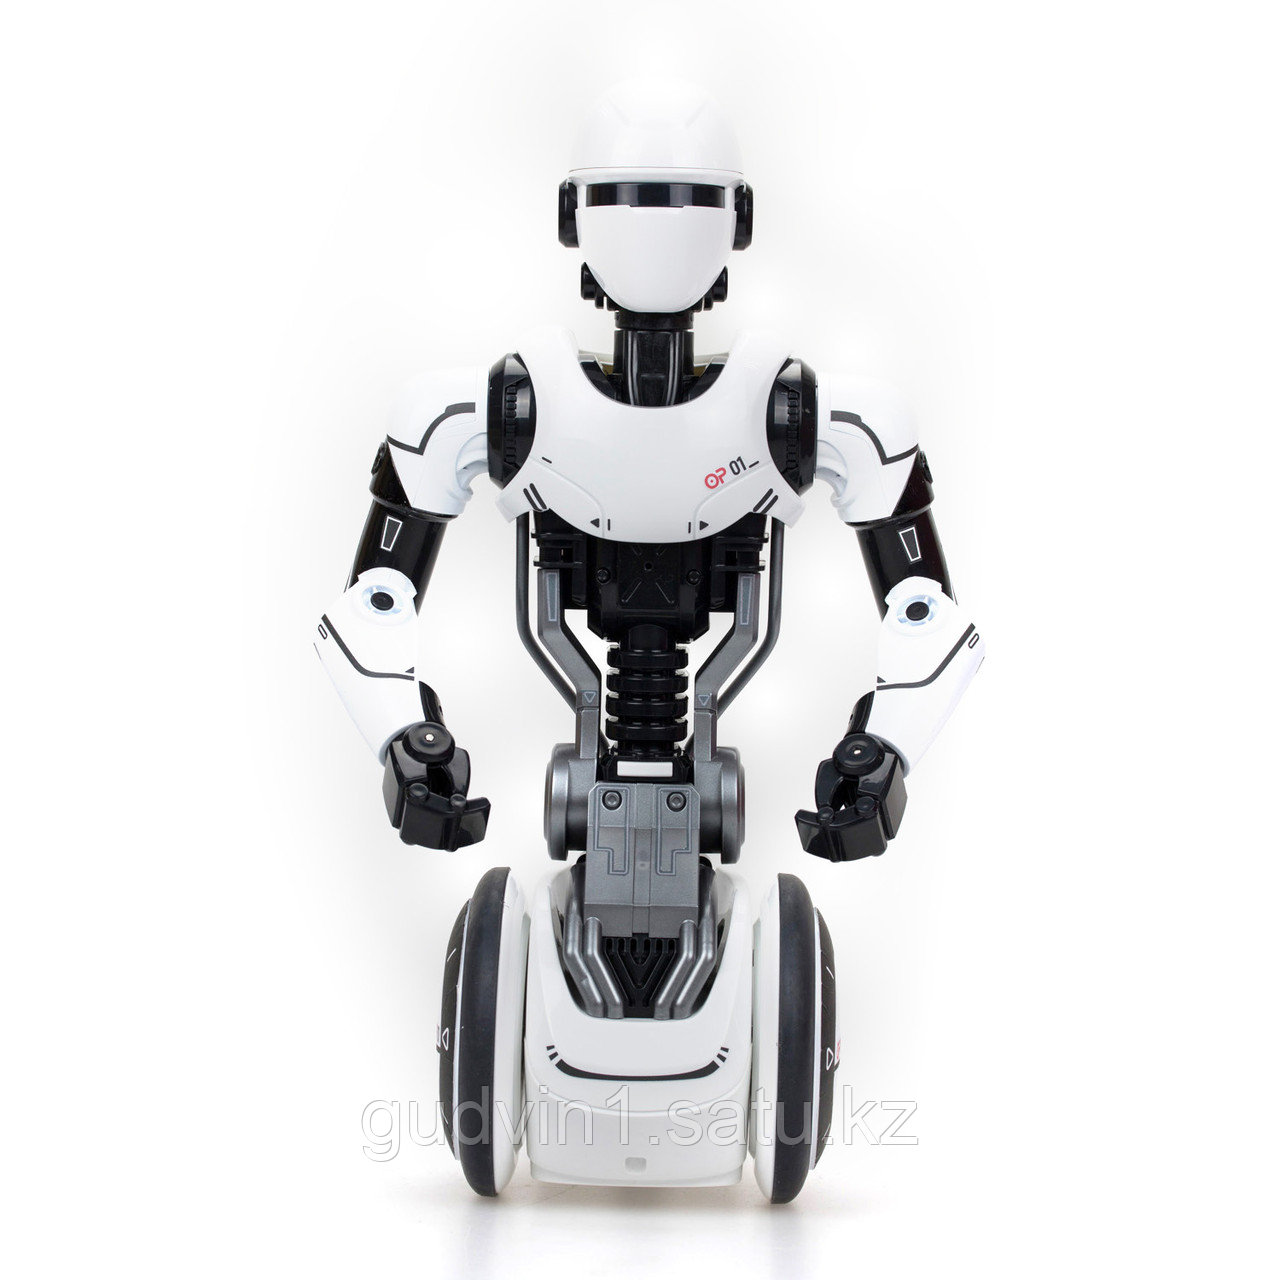 Робот O.P ONE (Оу Пи Уан) 88550S